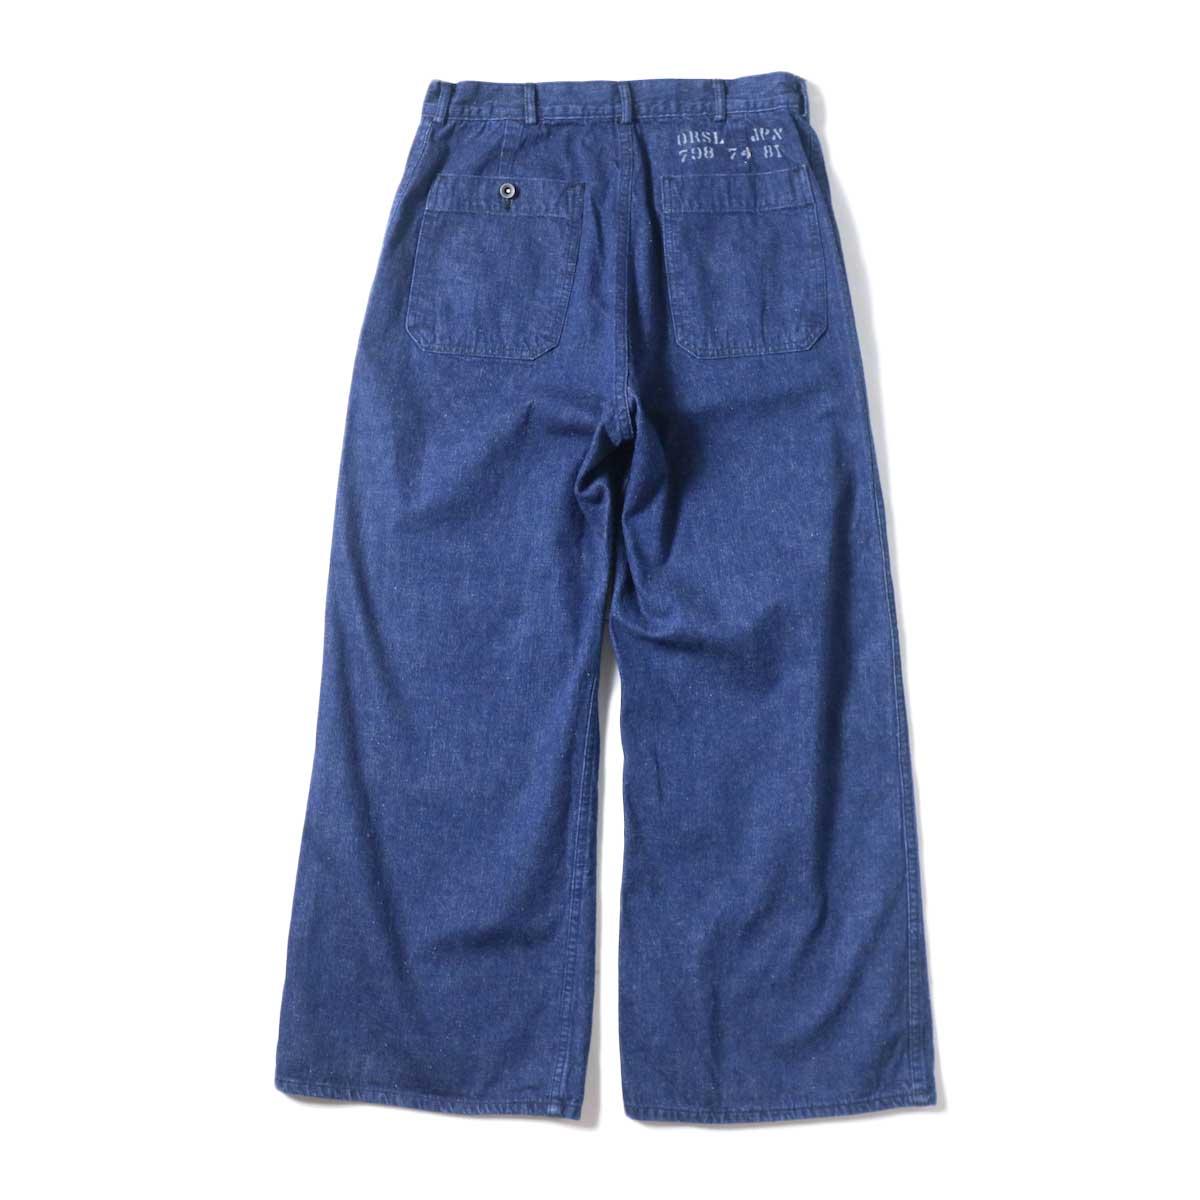 orSlow / US NAVY DENIM FLARE PANTS 背面